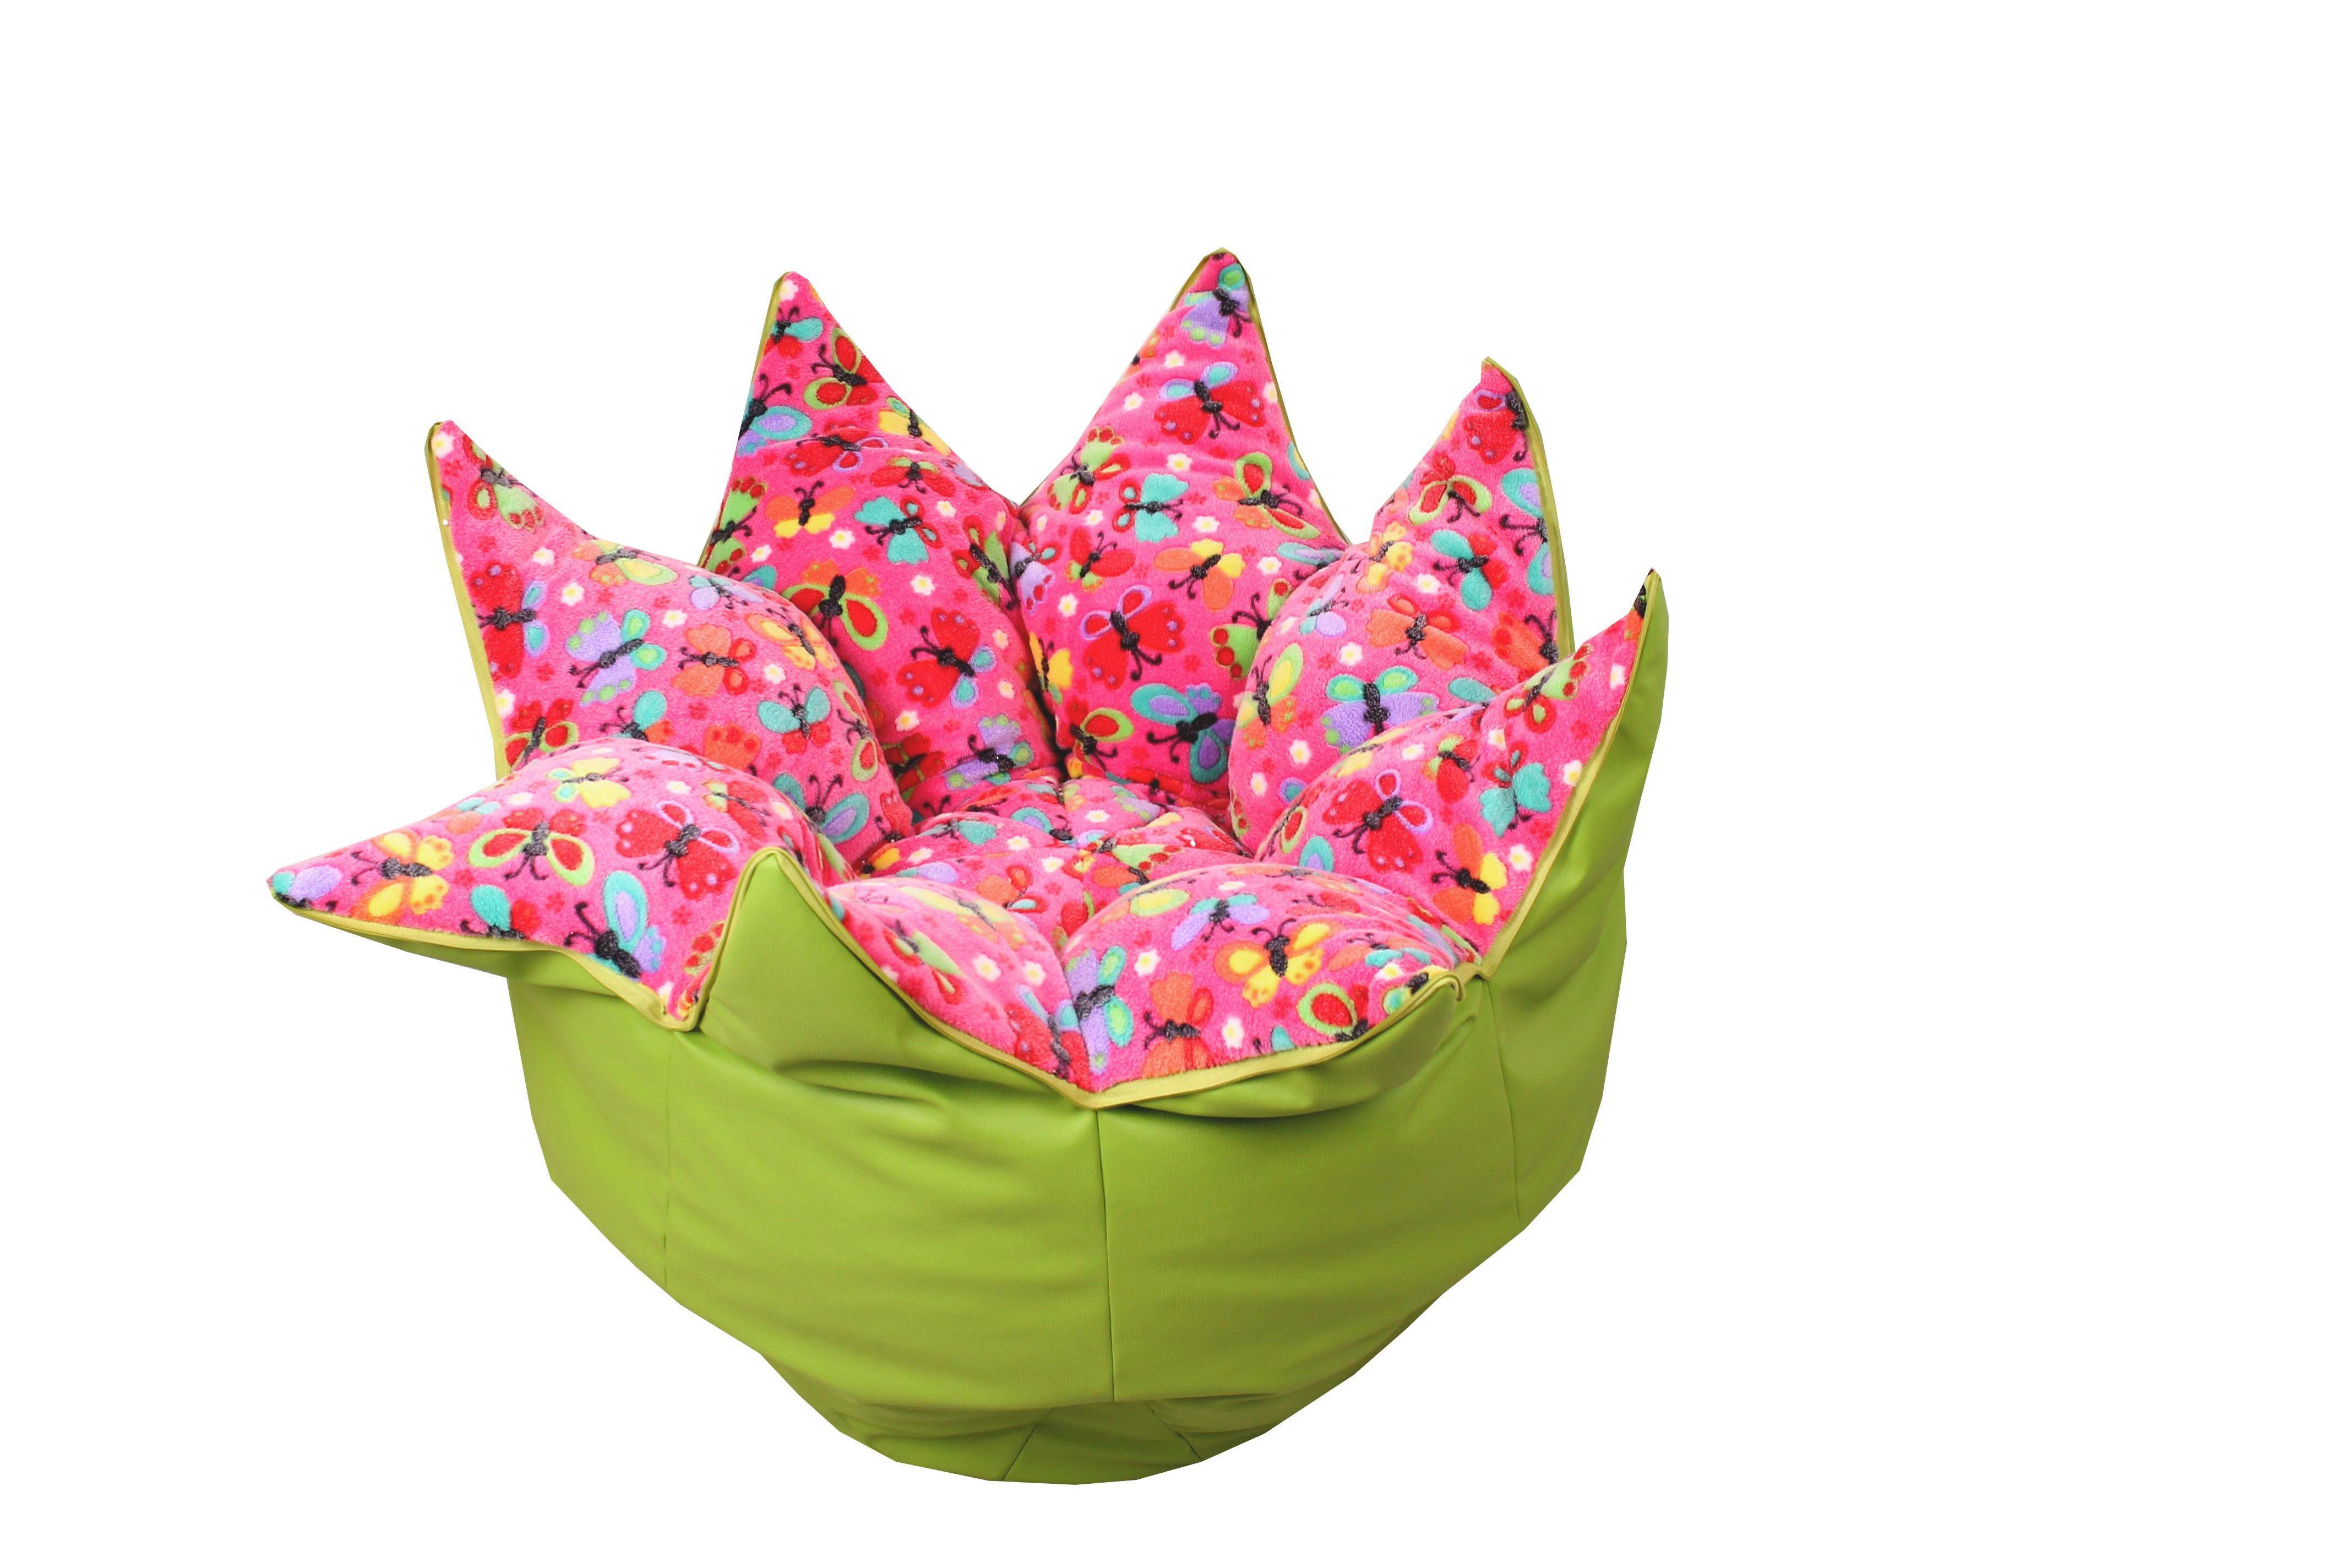 Sitzsack in Rosa/grün - Rosa/Grün, Textil (70/90/70cm) - MODERN LIVING